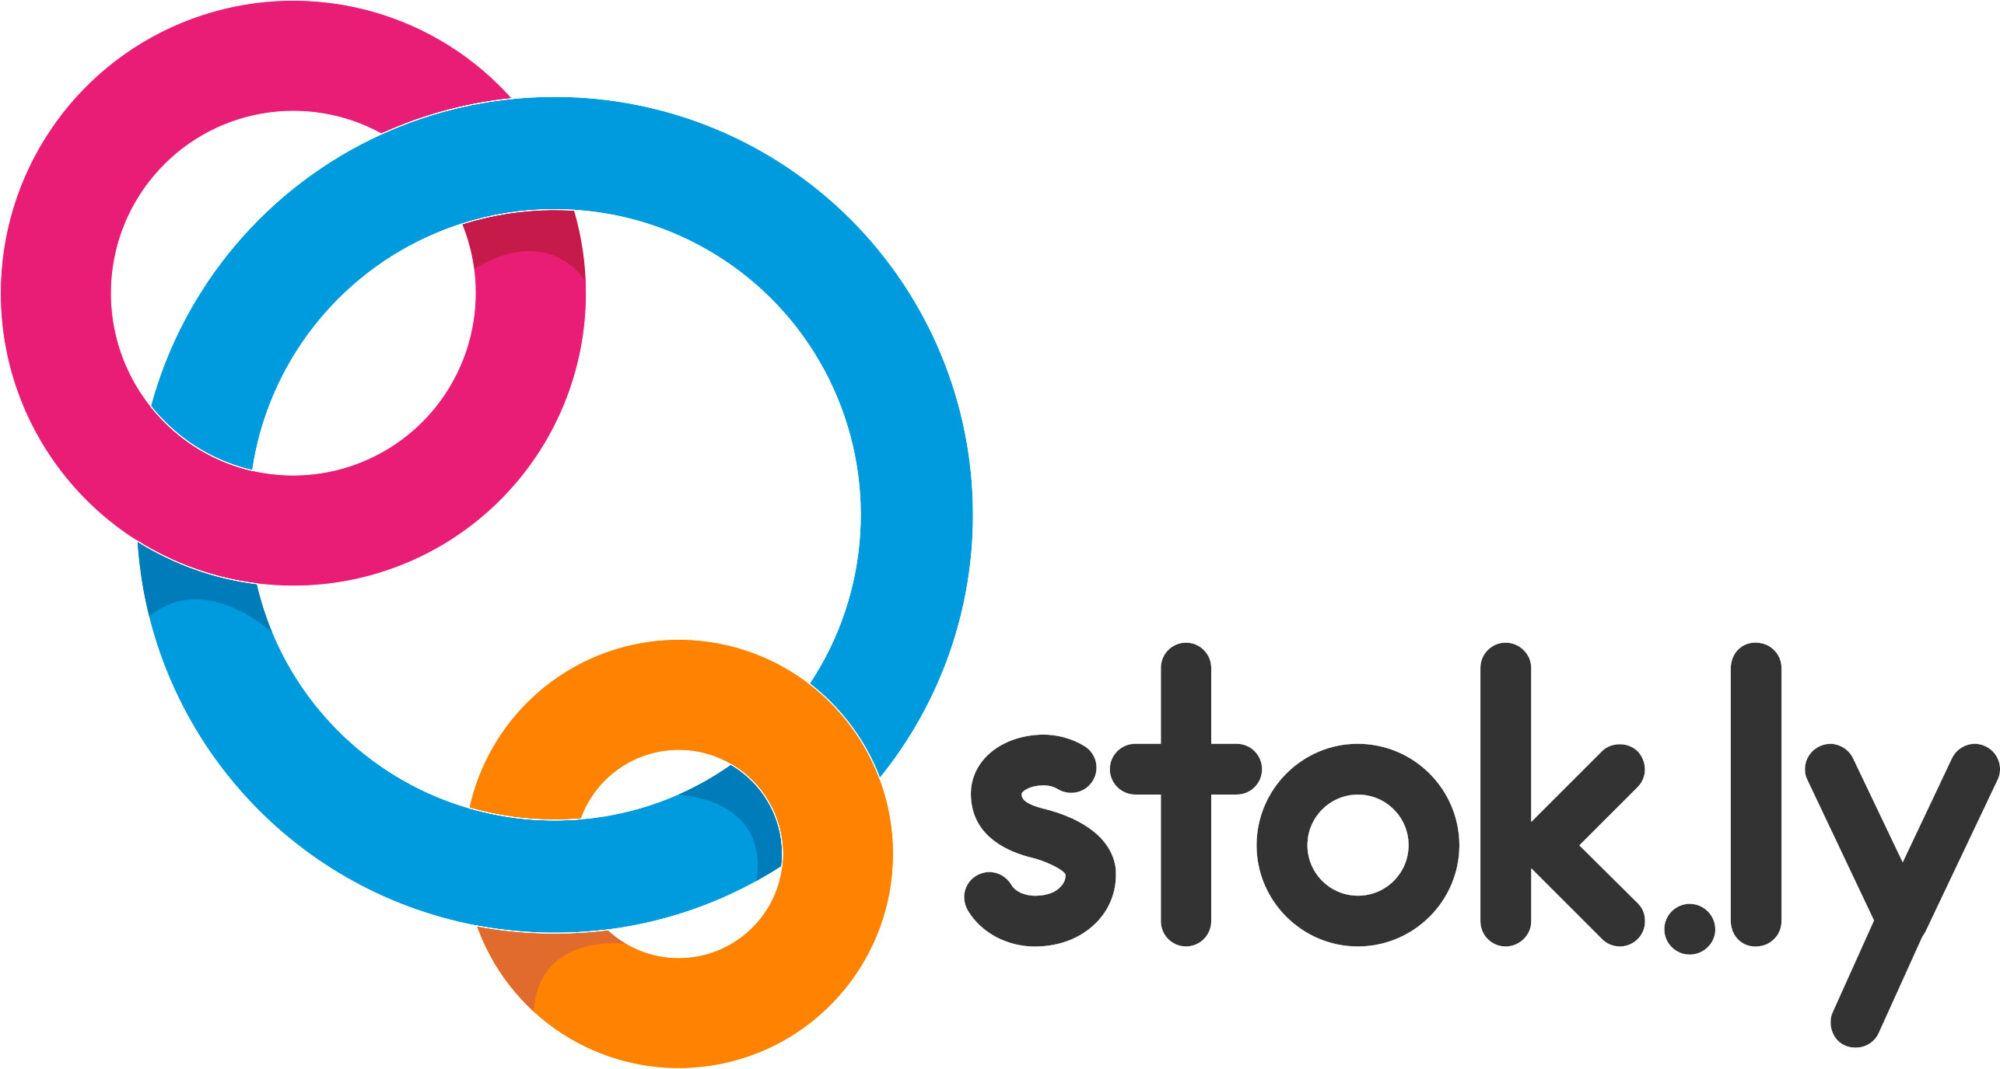 Stok.y Ltd